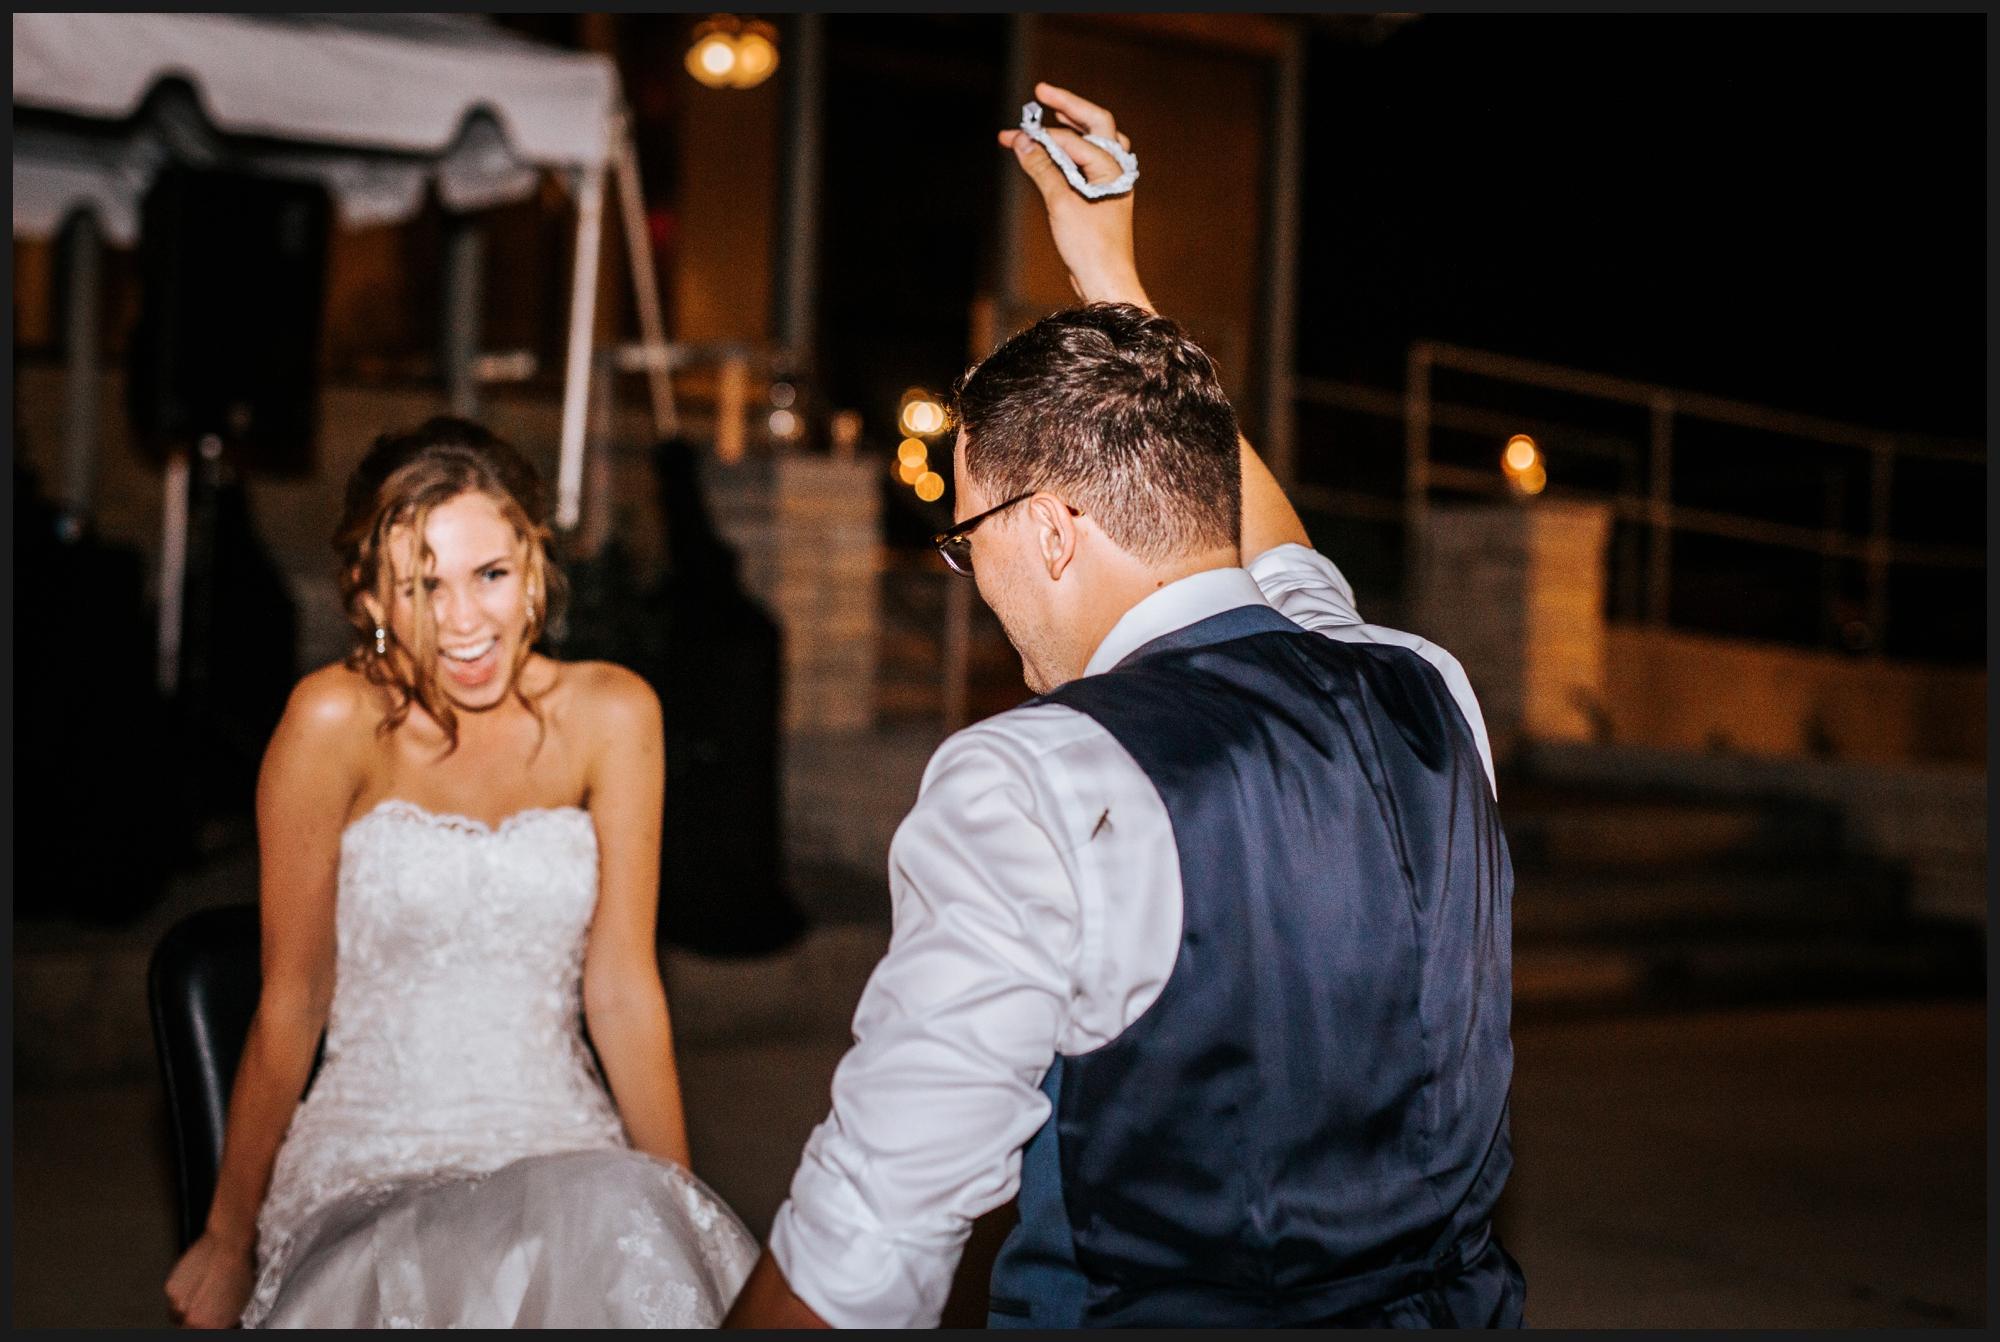 Orlando-Wedding-Photographer-destination-wedding-photographer-florida-wedding-photographer-bohemian-wedding-photographer_0132.jpg